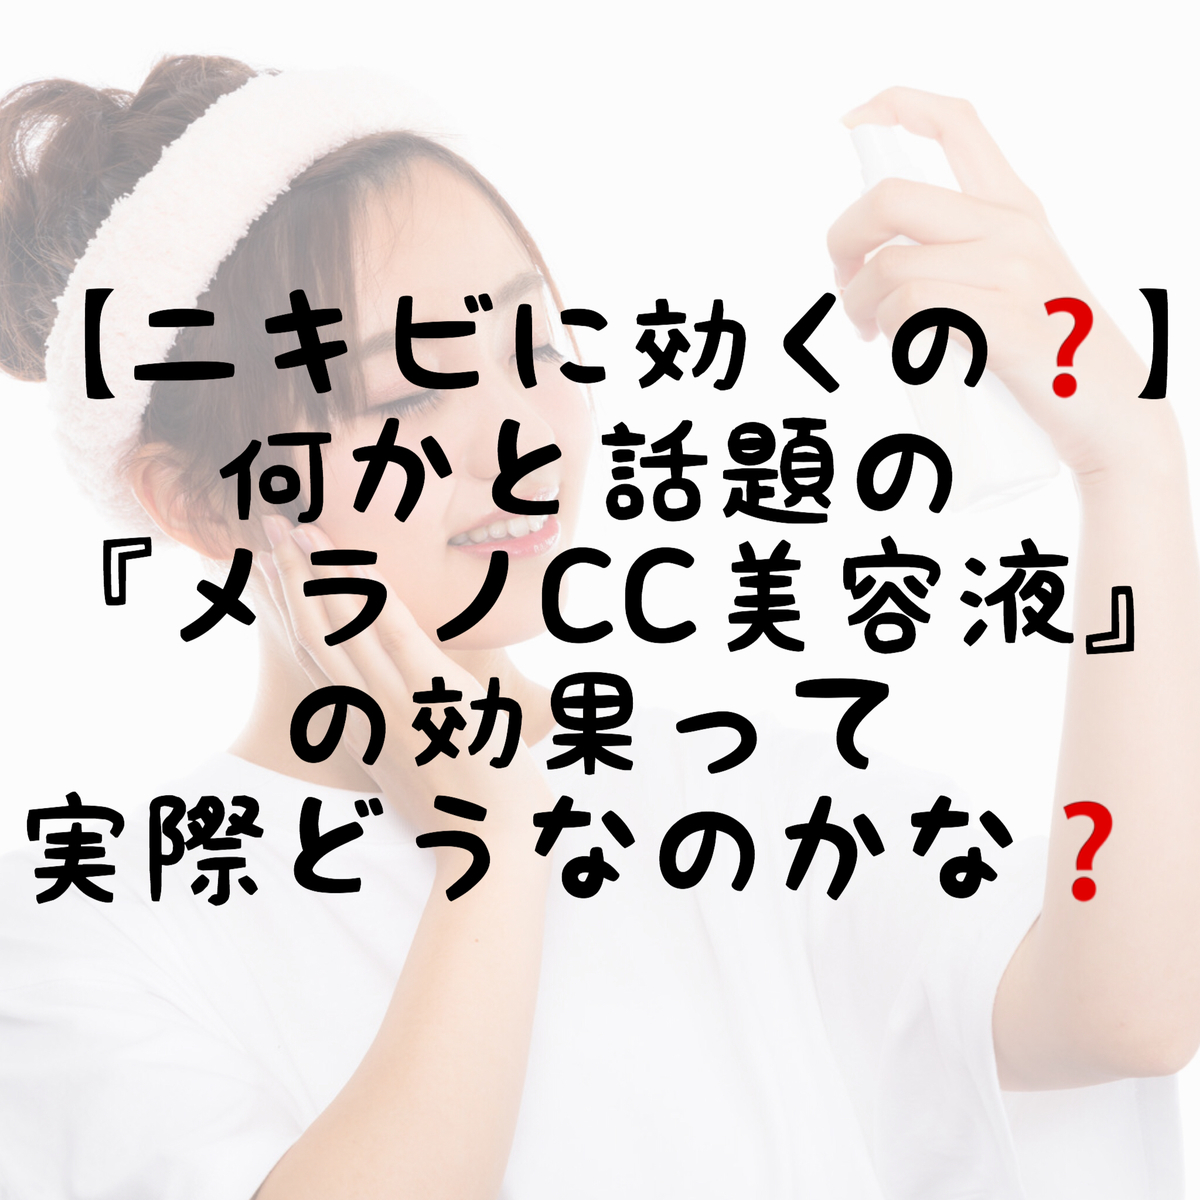 f:id:nokonoko_o:20200614175805j:plain